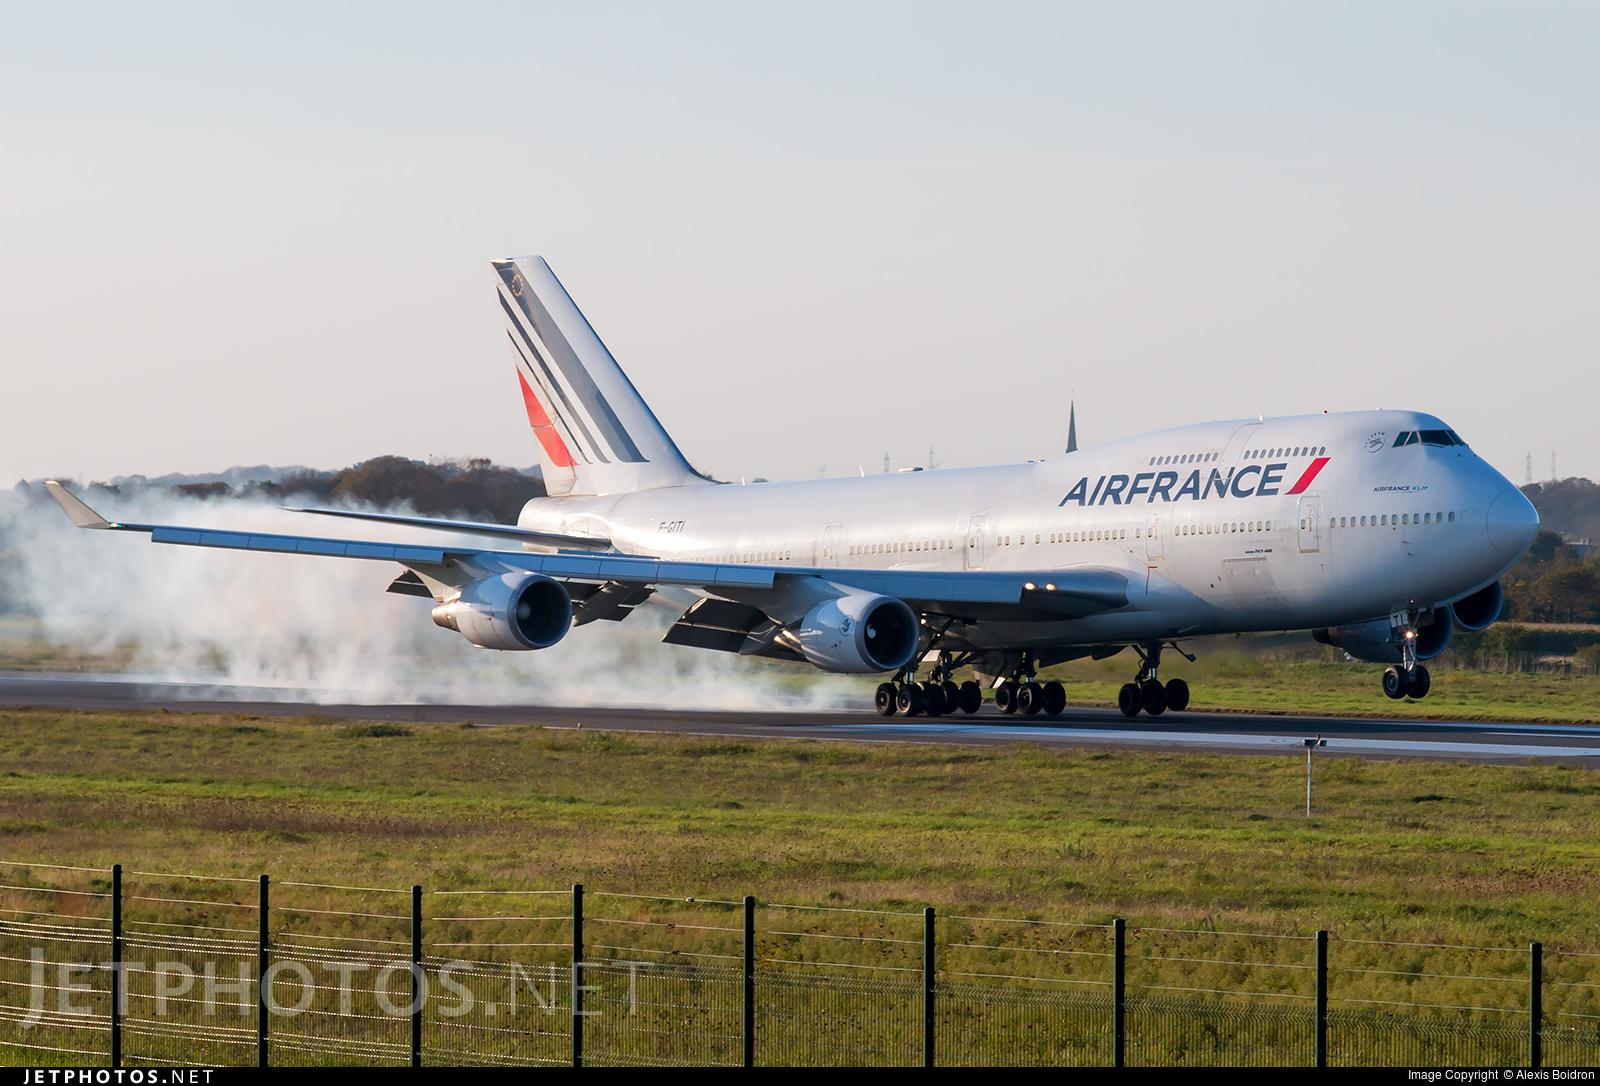 f giti boeing 747 428 air france alexis boidron jetphotos. Black Bedroom Furniture Sets. Home Design Ideas